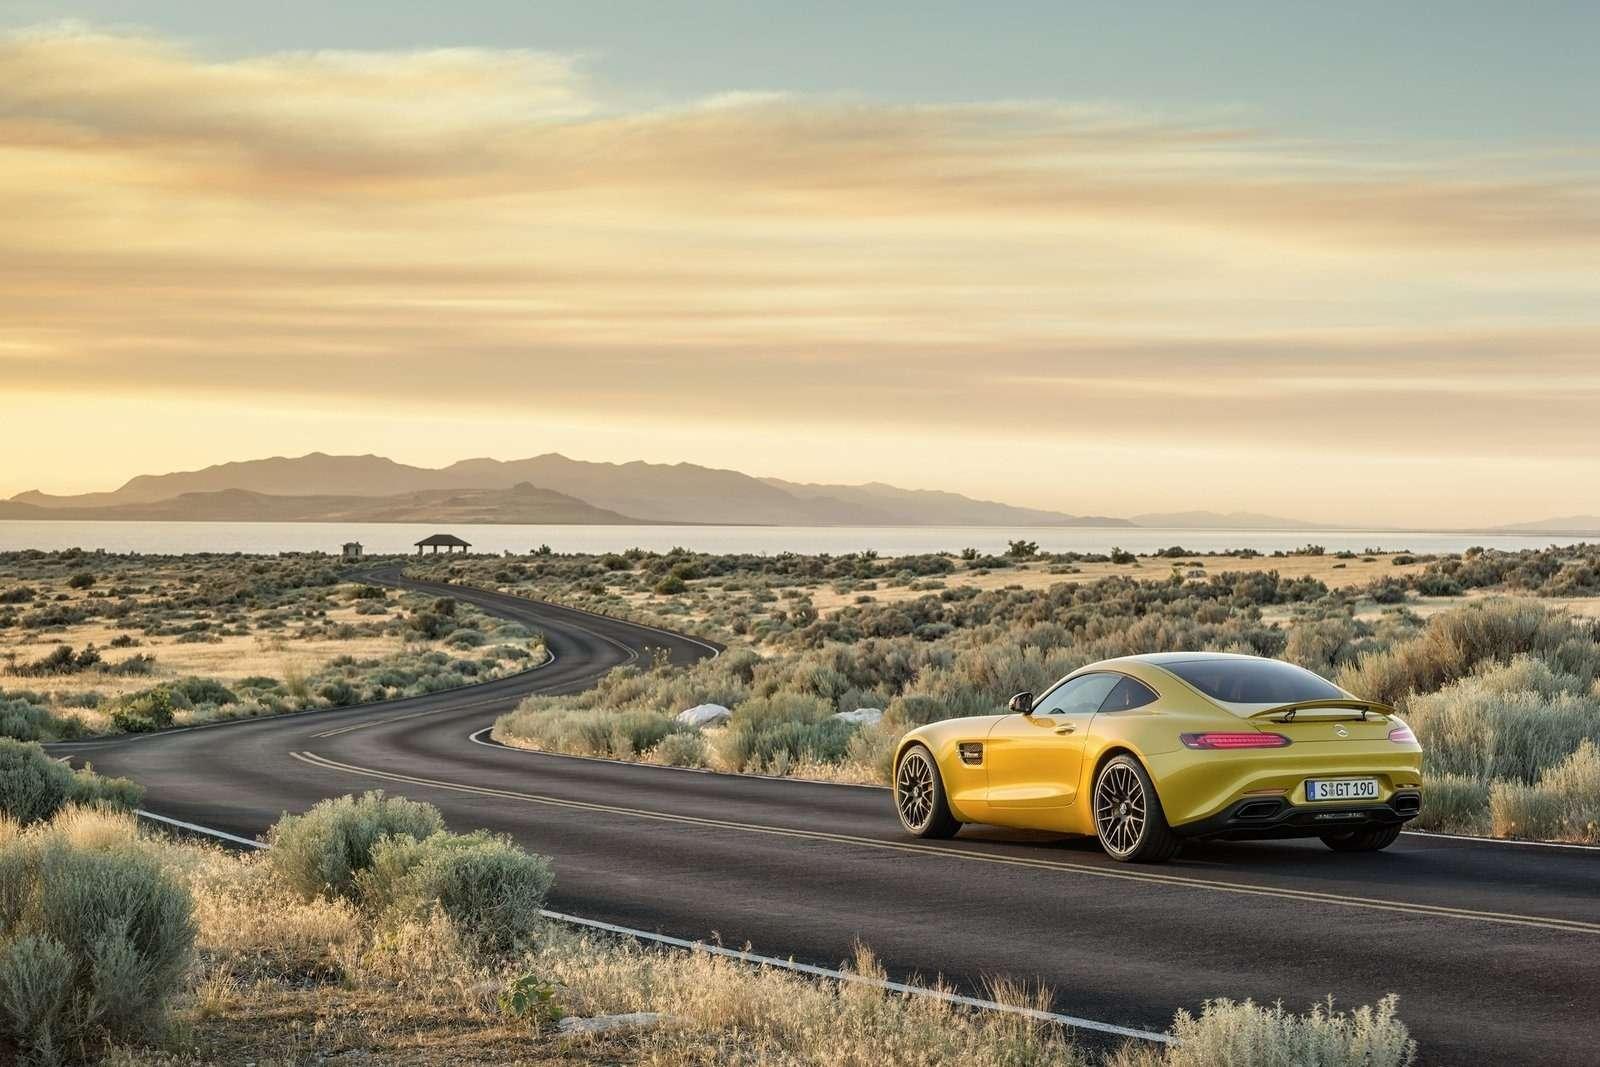 Mercedes-Benz-AMG_GT_2016_1600x1200_wallpaper_0e